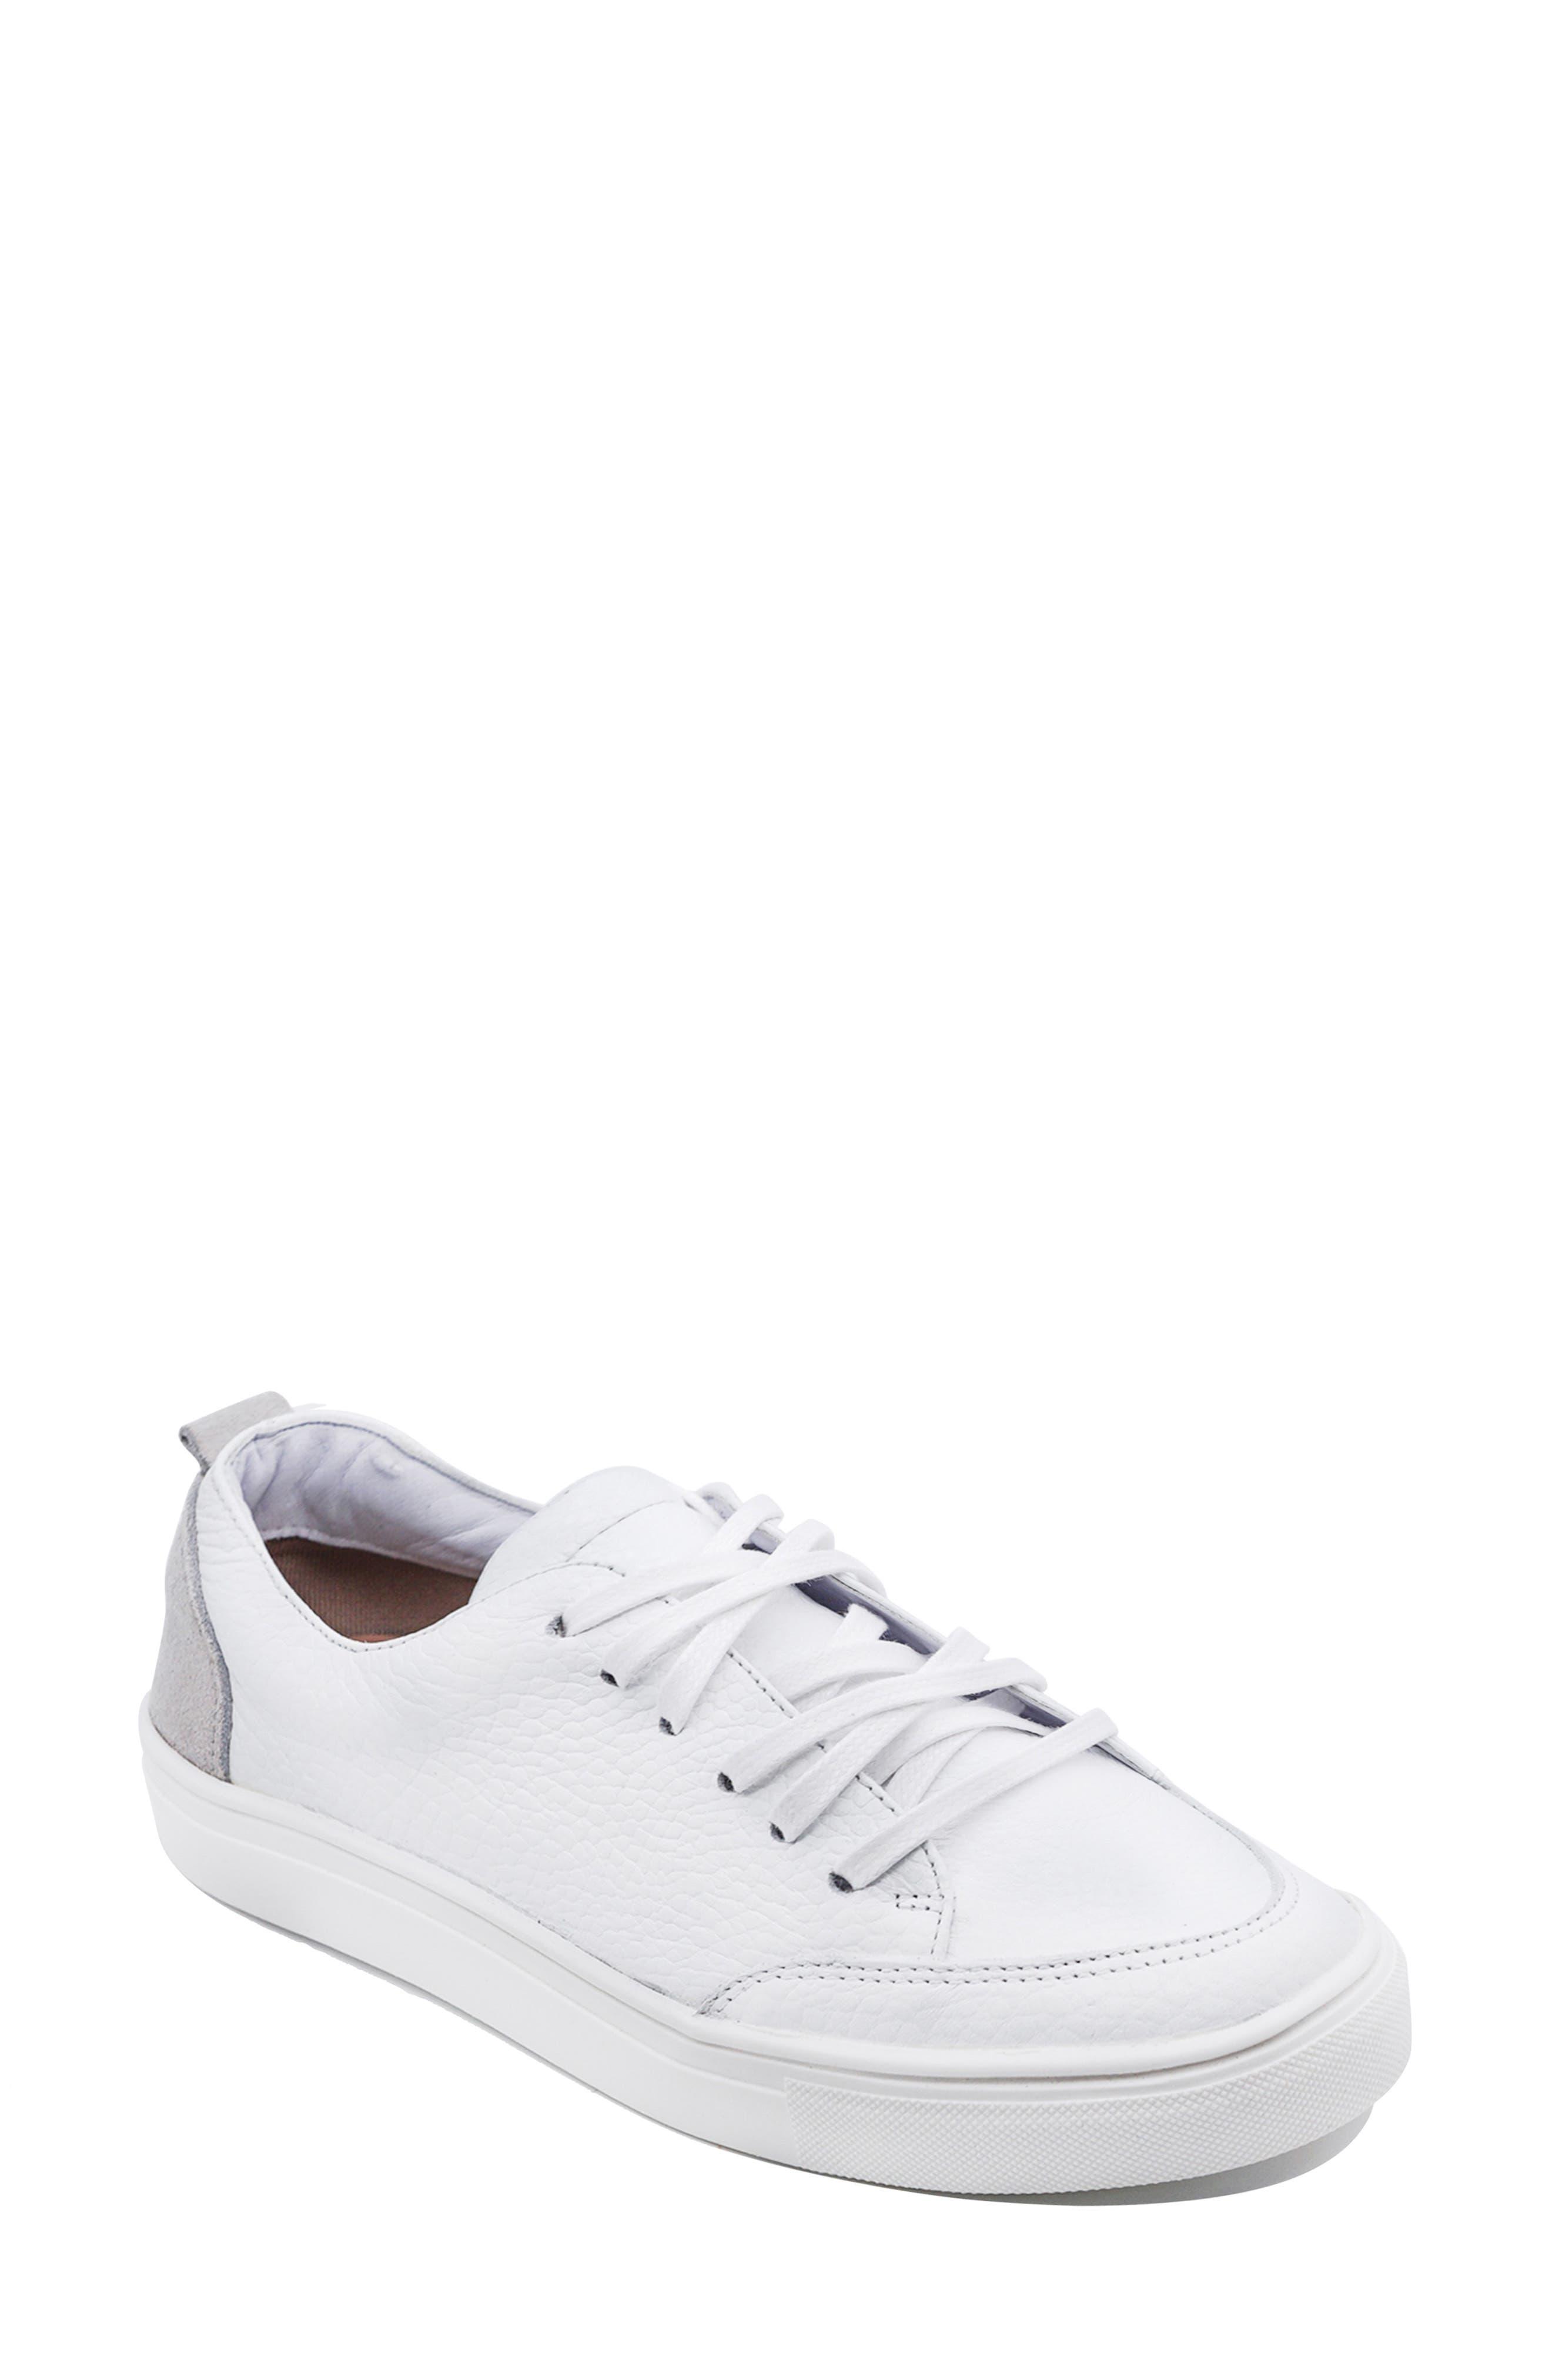 X Jessie James Decker Paris Low Top Sneaker